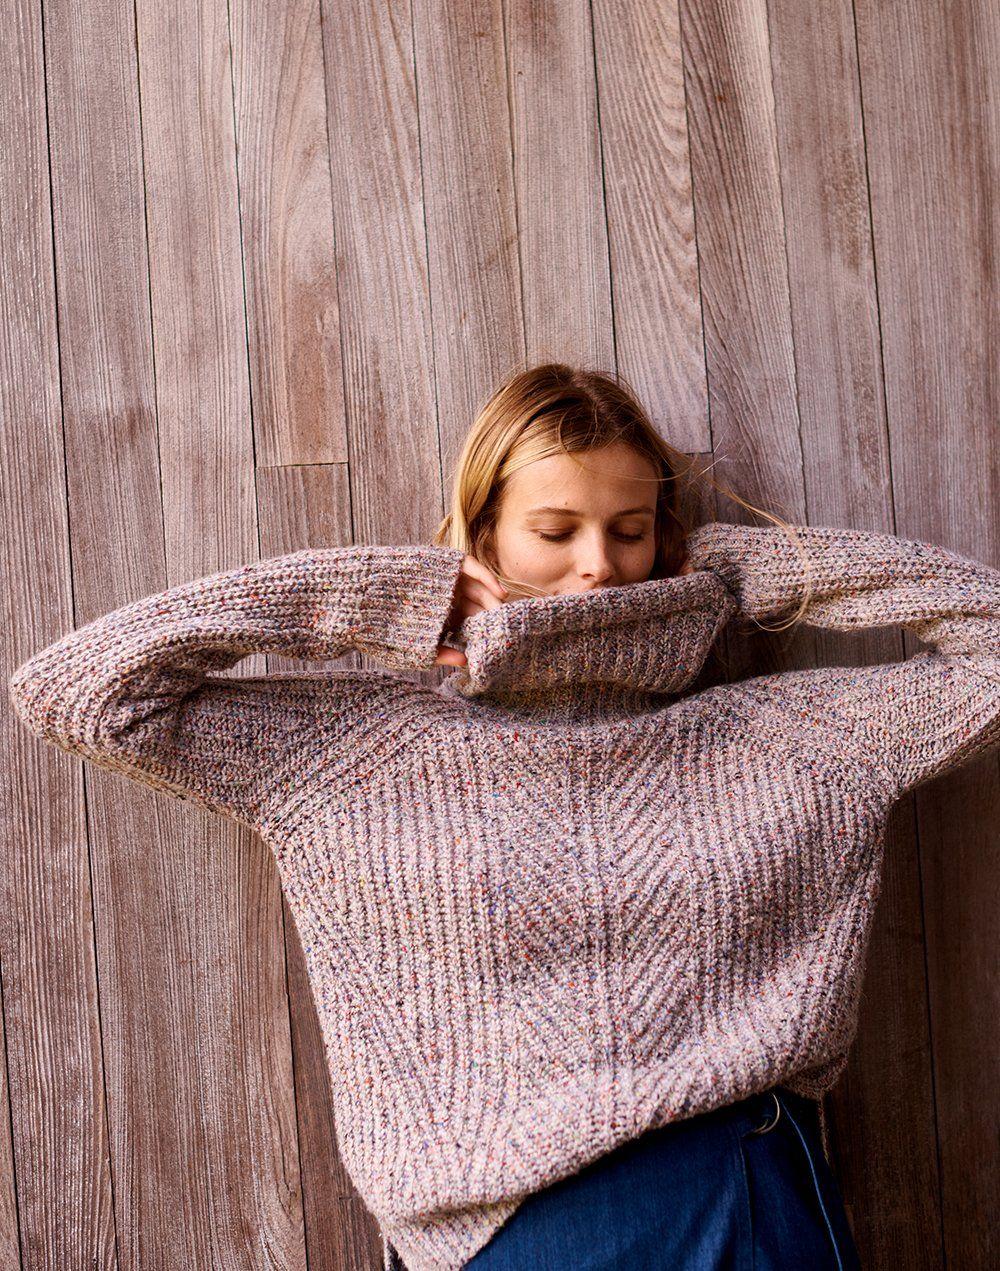 fbd50d93f6 madewell colorfleck turtleneck sweater worn with denim raw-hem mini wrap  skirt.